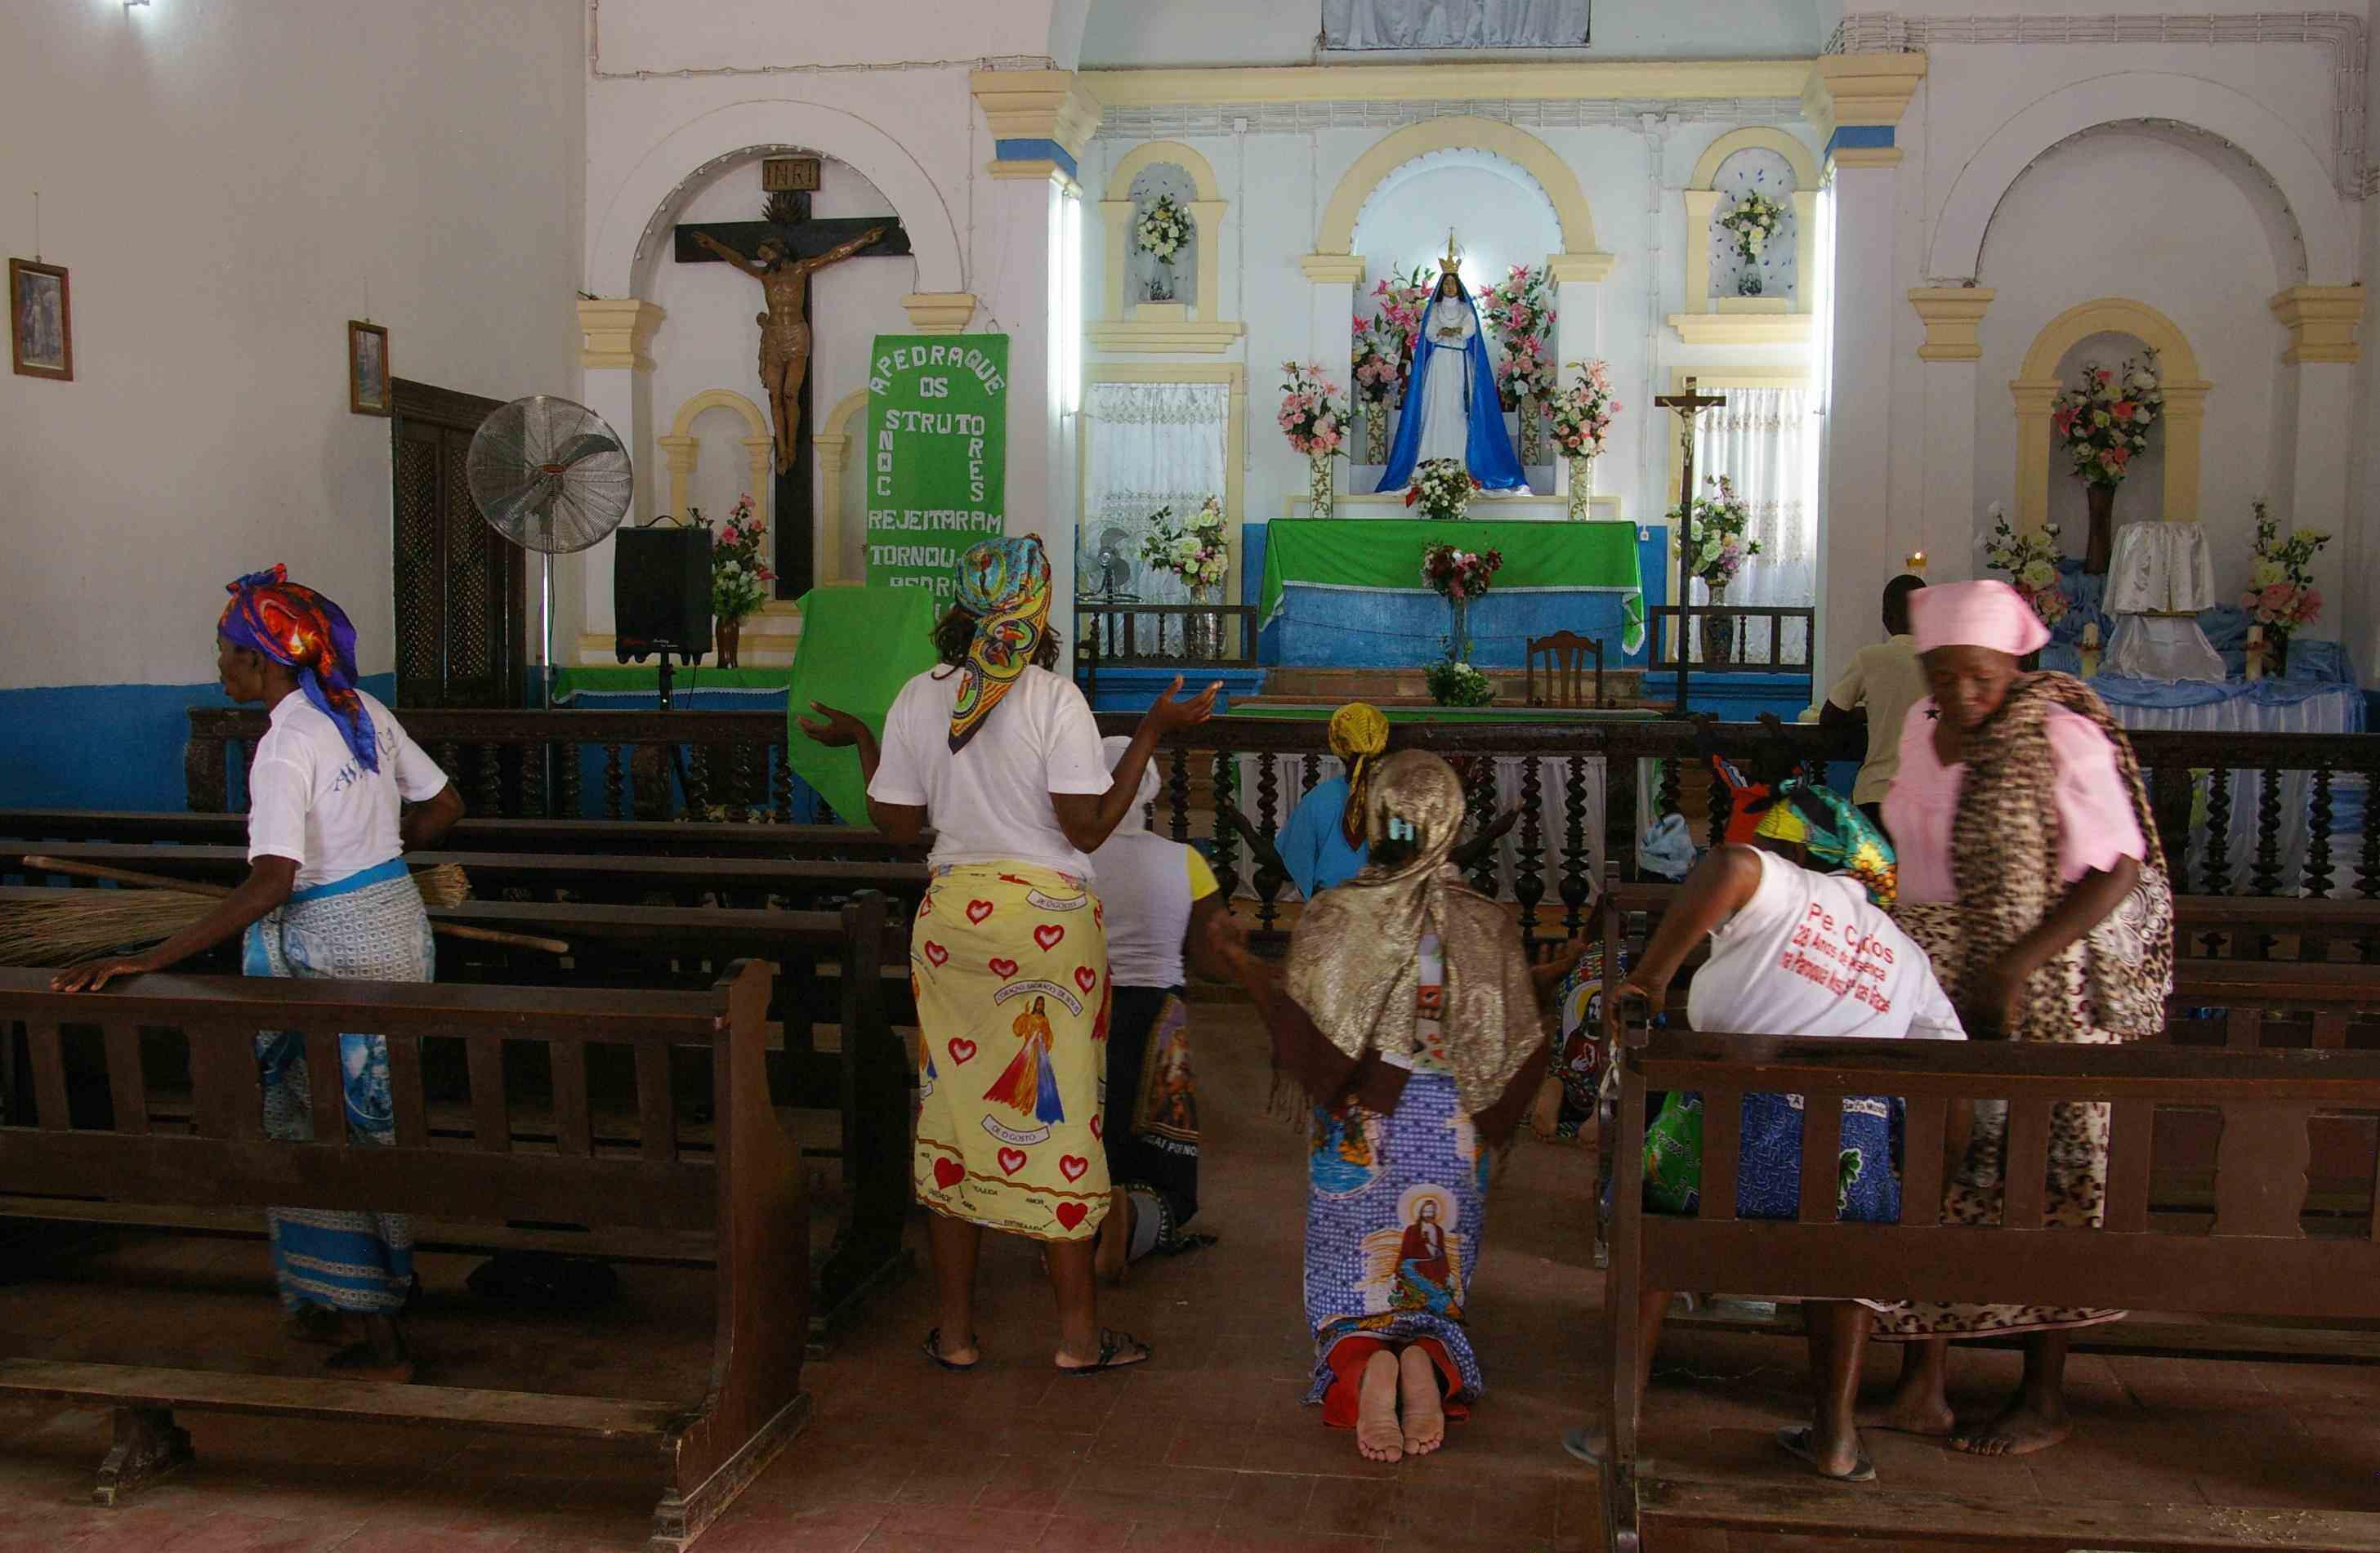 Devotees praying to Mama Muxima inside the church.